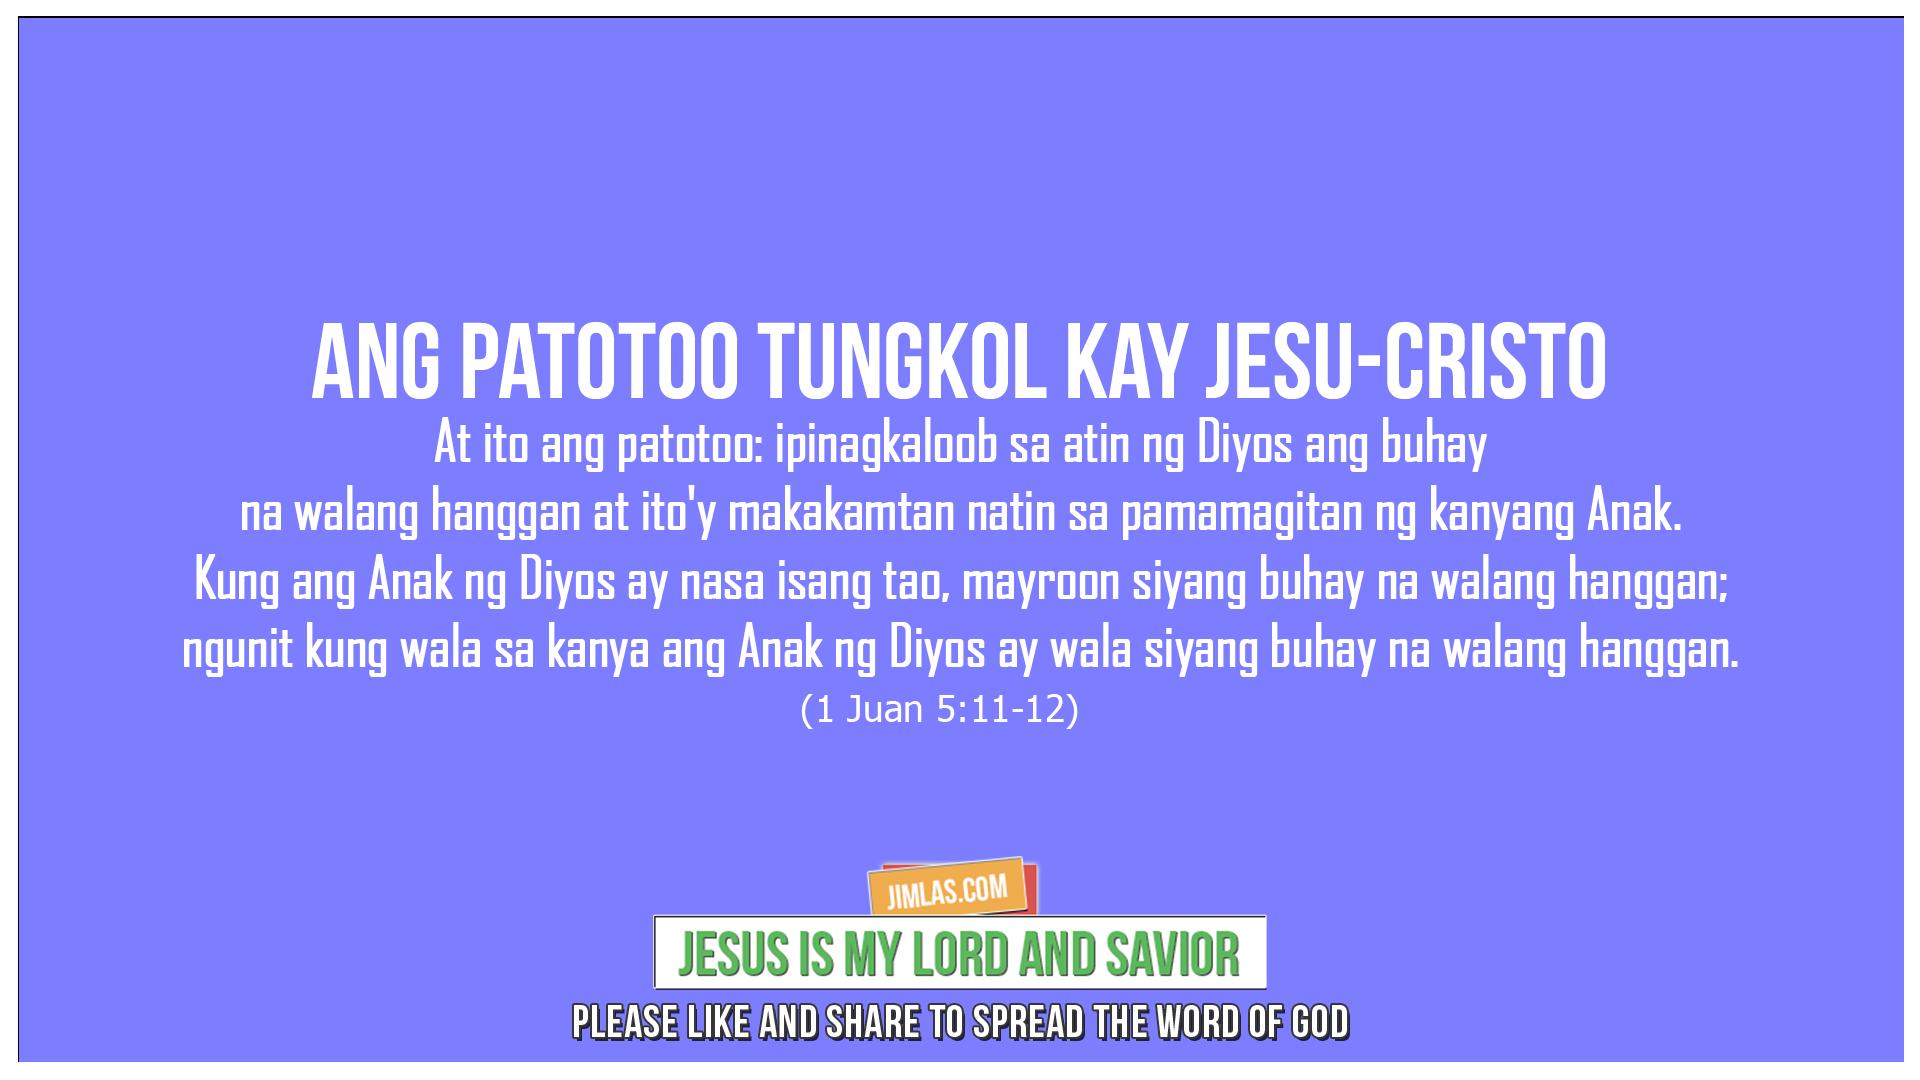 1 Juan 5:11-12, 1 Juan 5:11-12